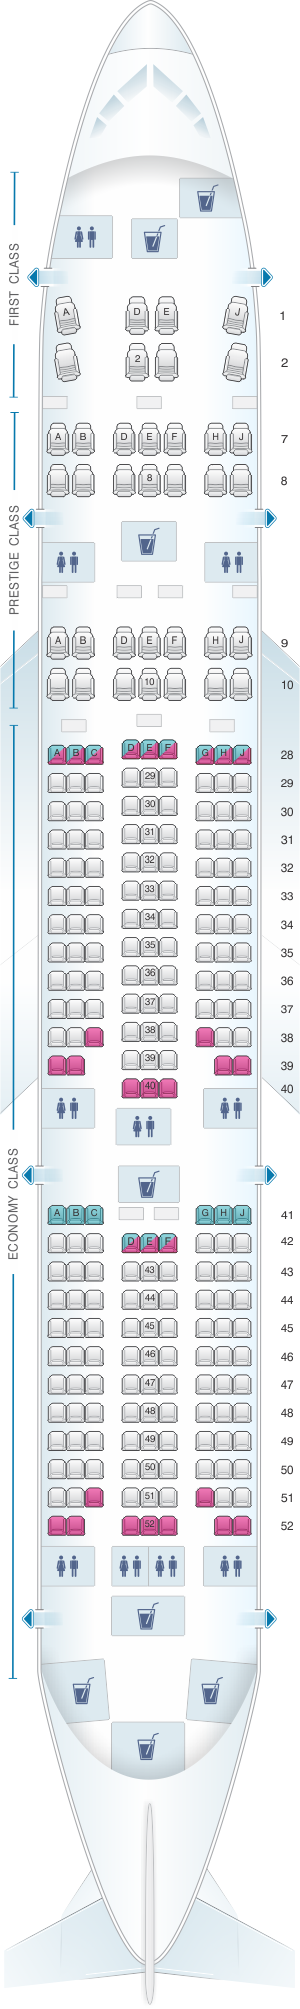 Seat map for Korean Air Boeing B777 200ER 248PAX